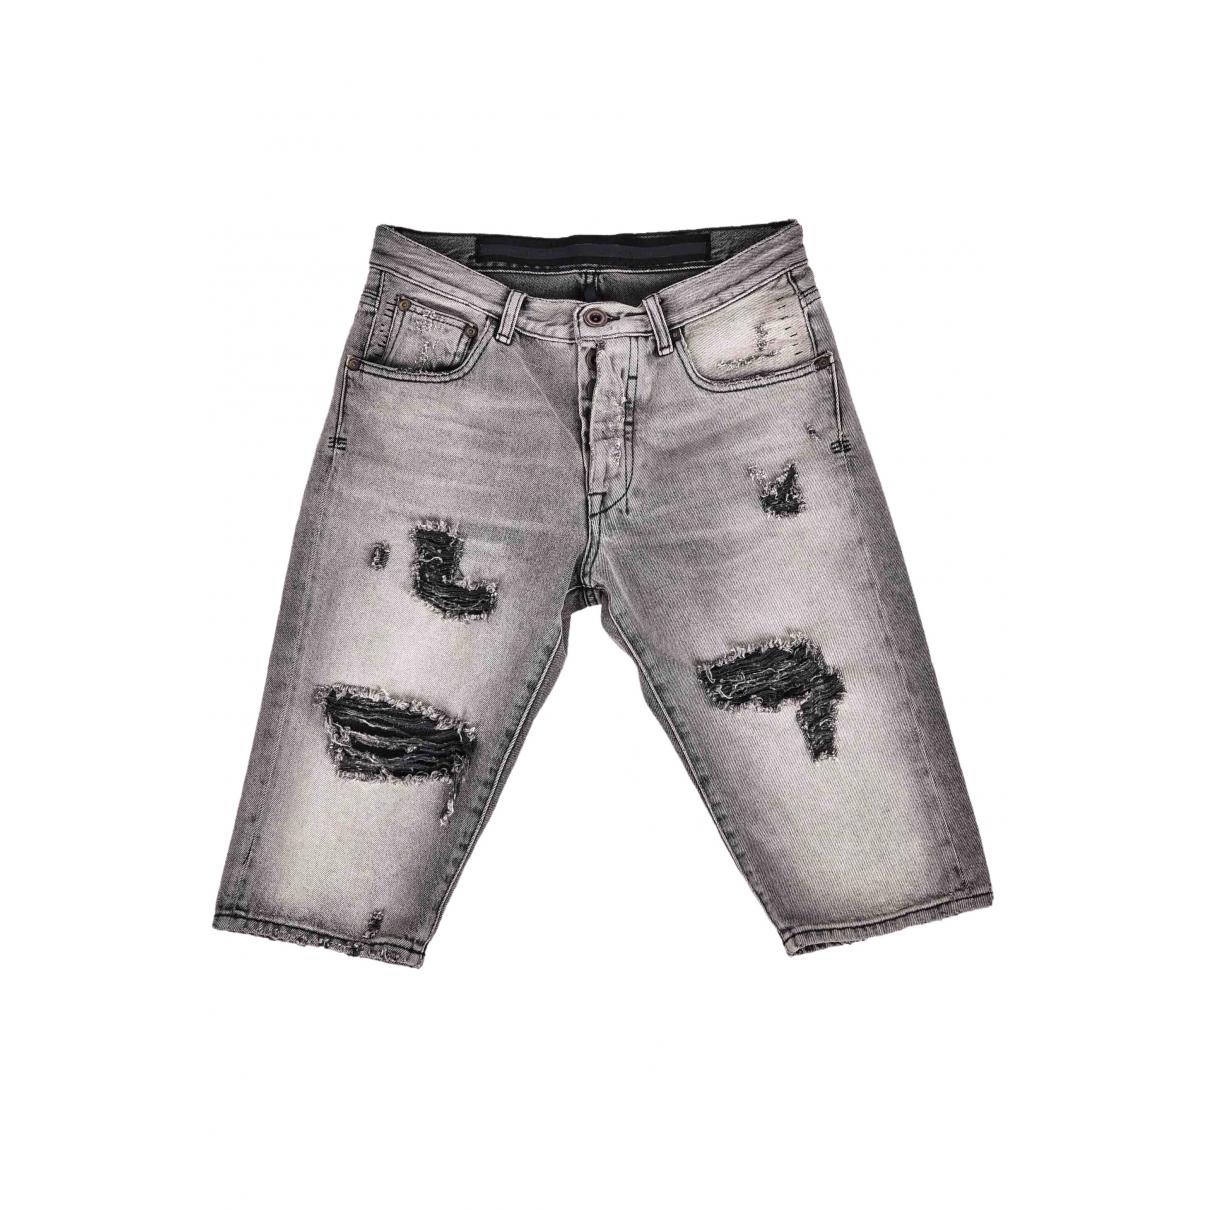 Unravel Project \N Grey Denim - Jeans Shorts for Men 28 UK - US